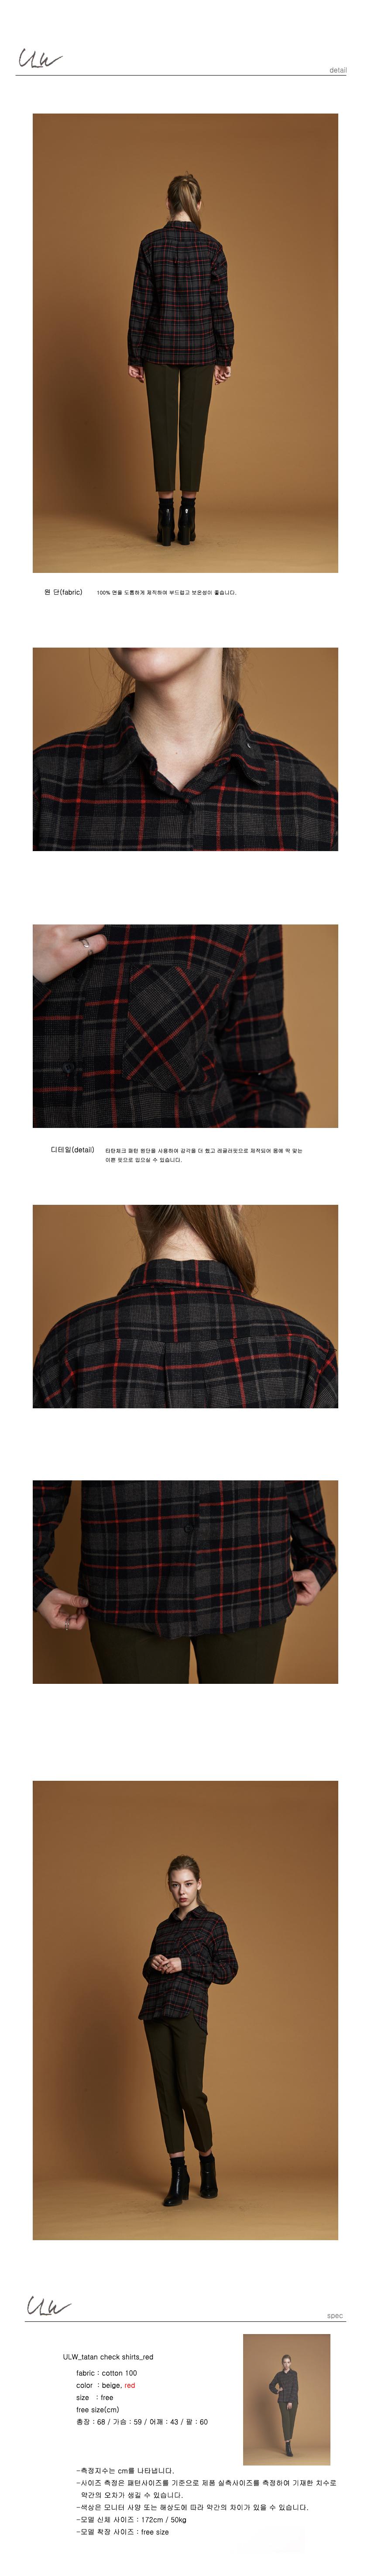 ulw_tatan-check-shirts_red_2.jpg